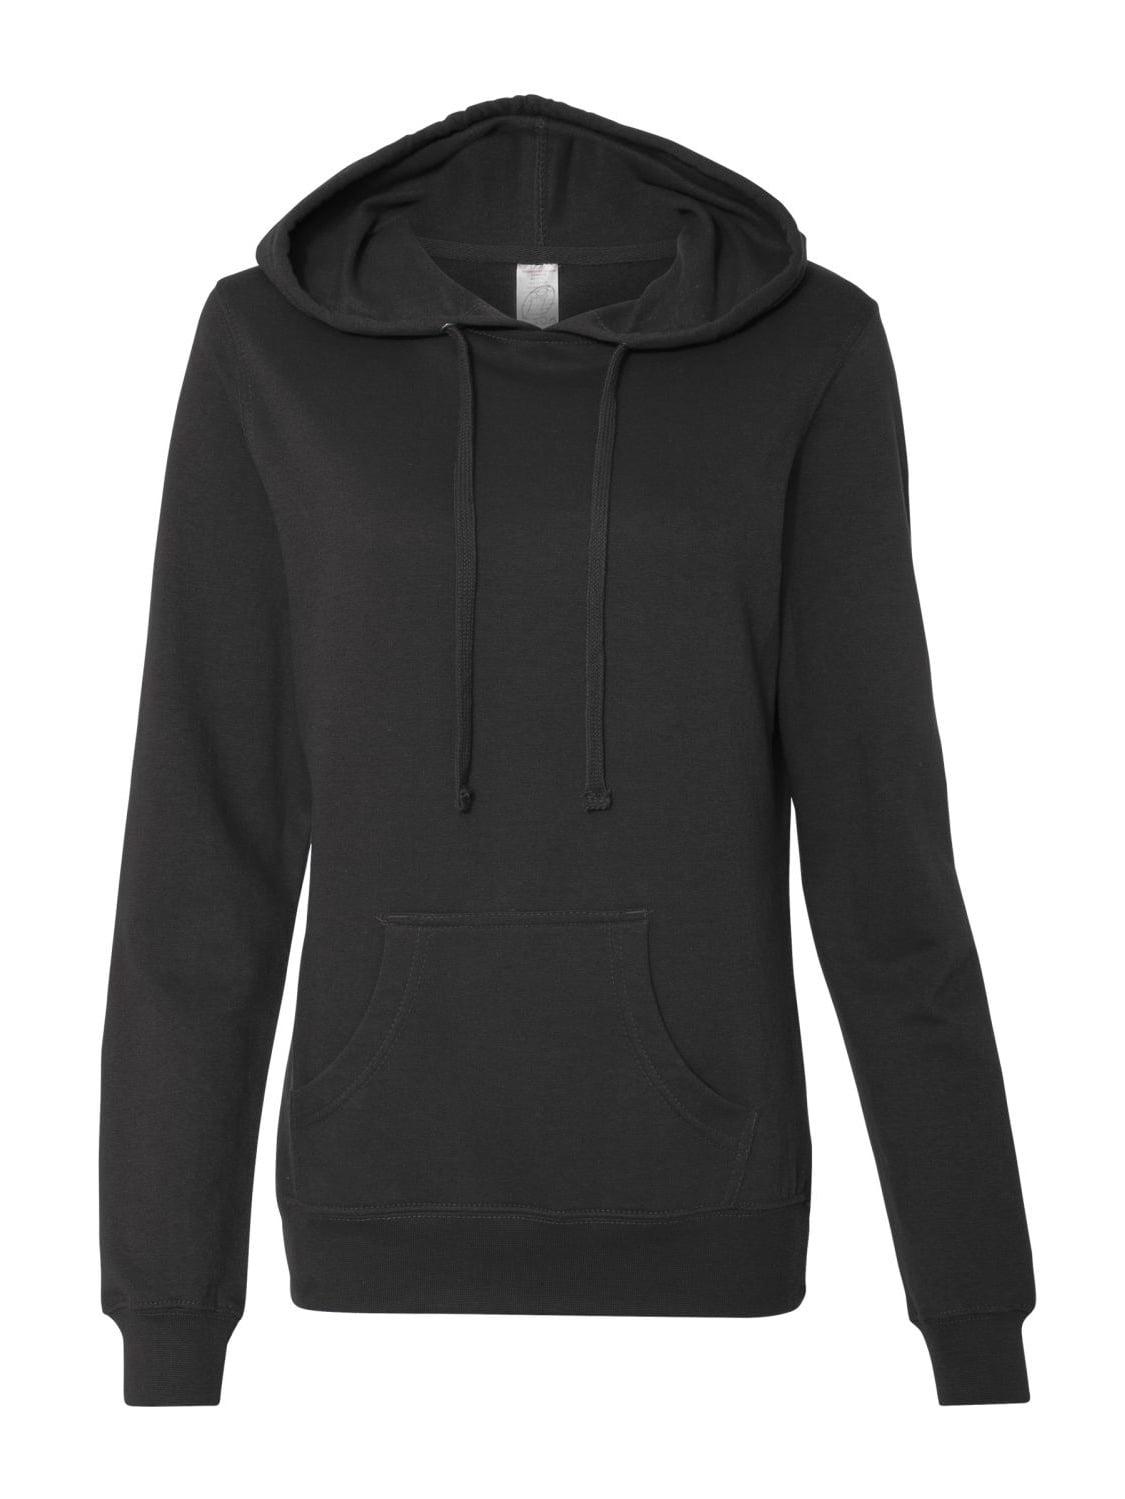 Independent Trading Co. Fleece Juniors' Lightweight Pullover Hooded Sweatshirt